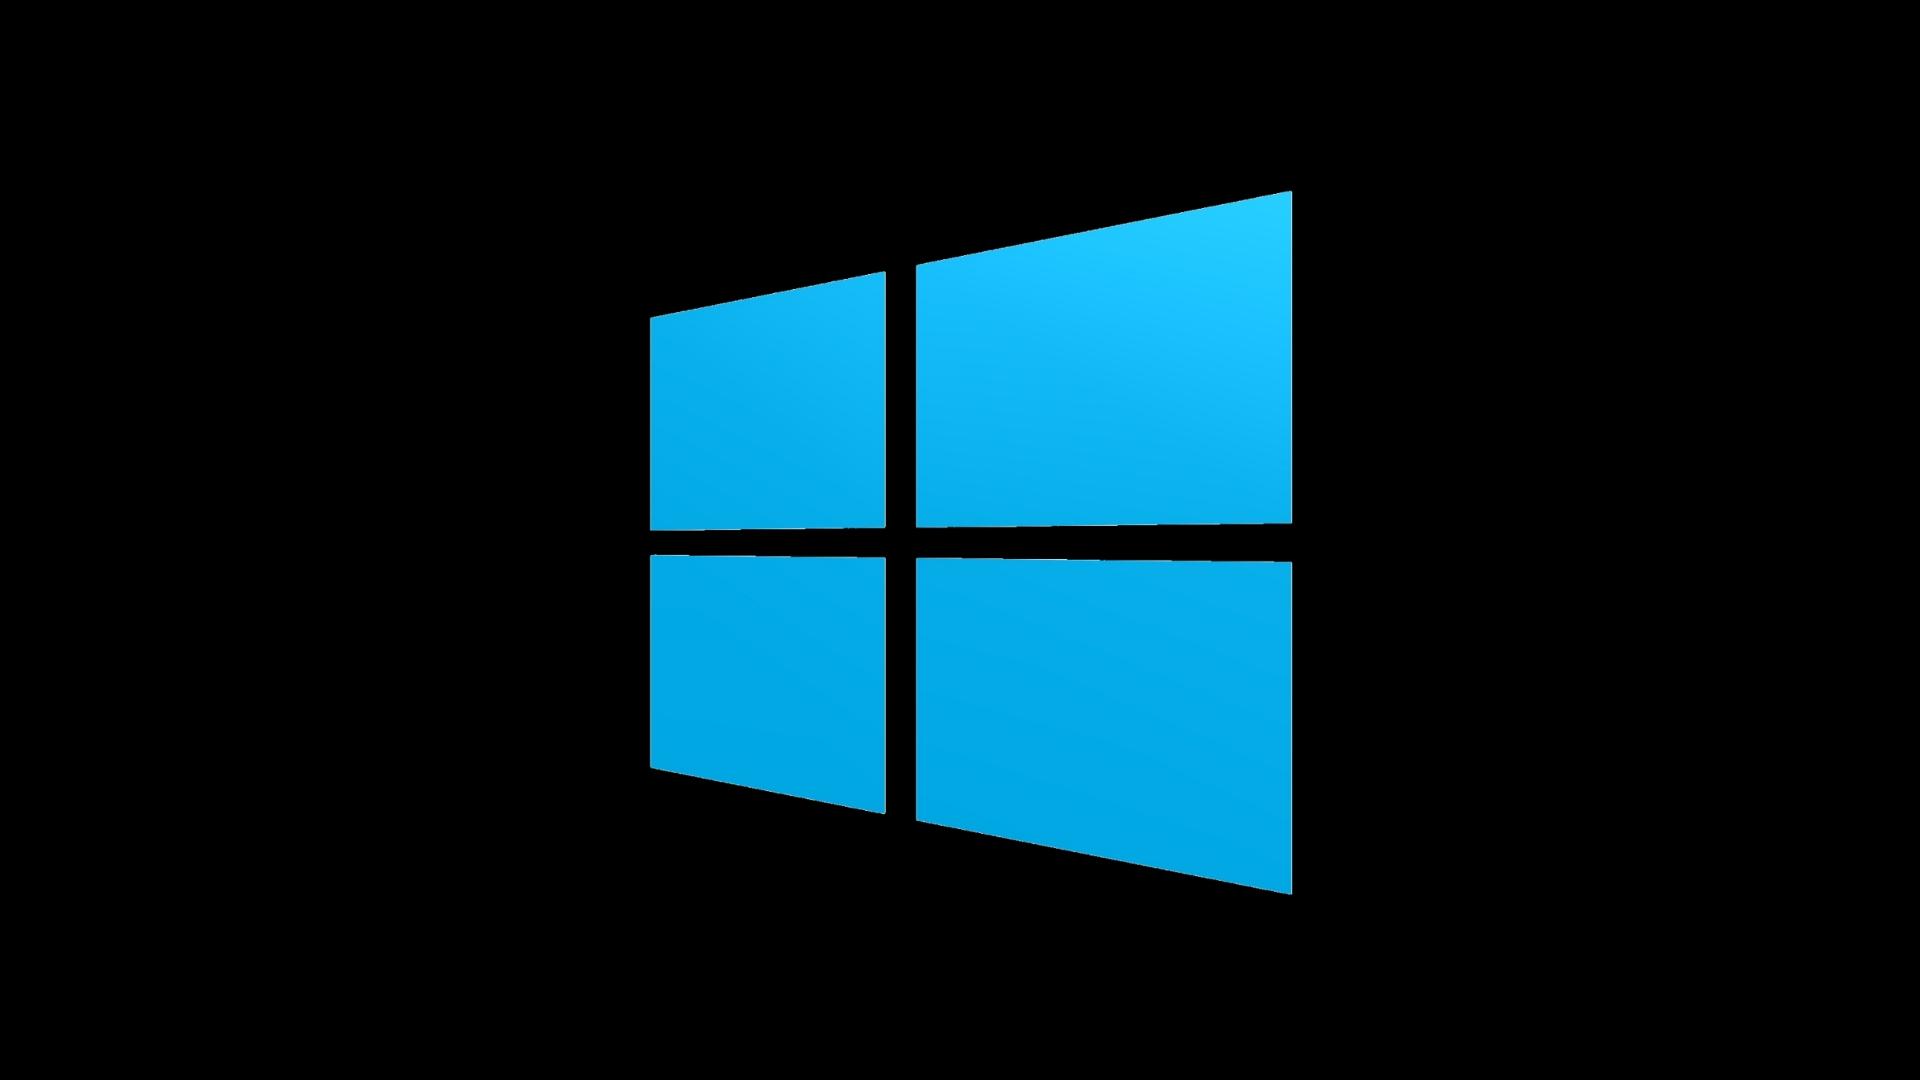 windows 10 wallpaper logo wallpapersafari